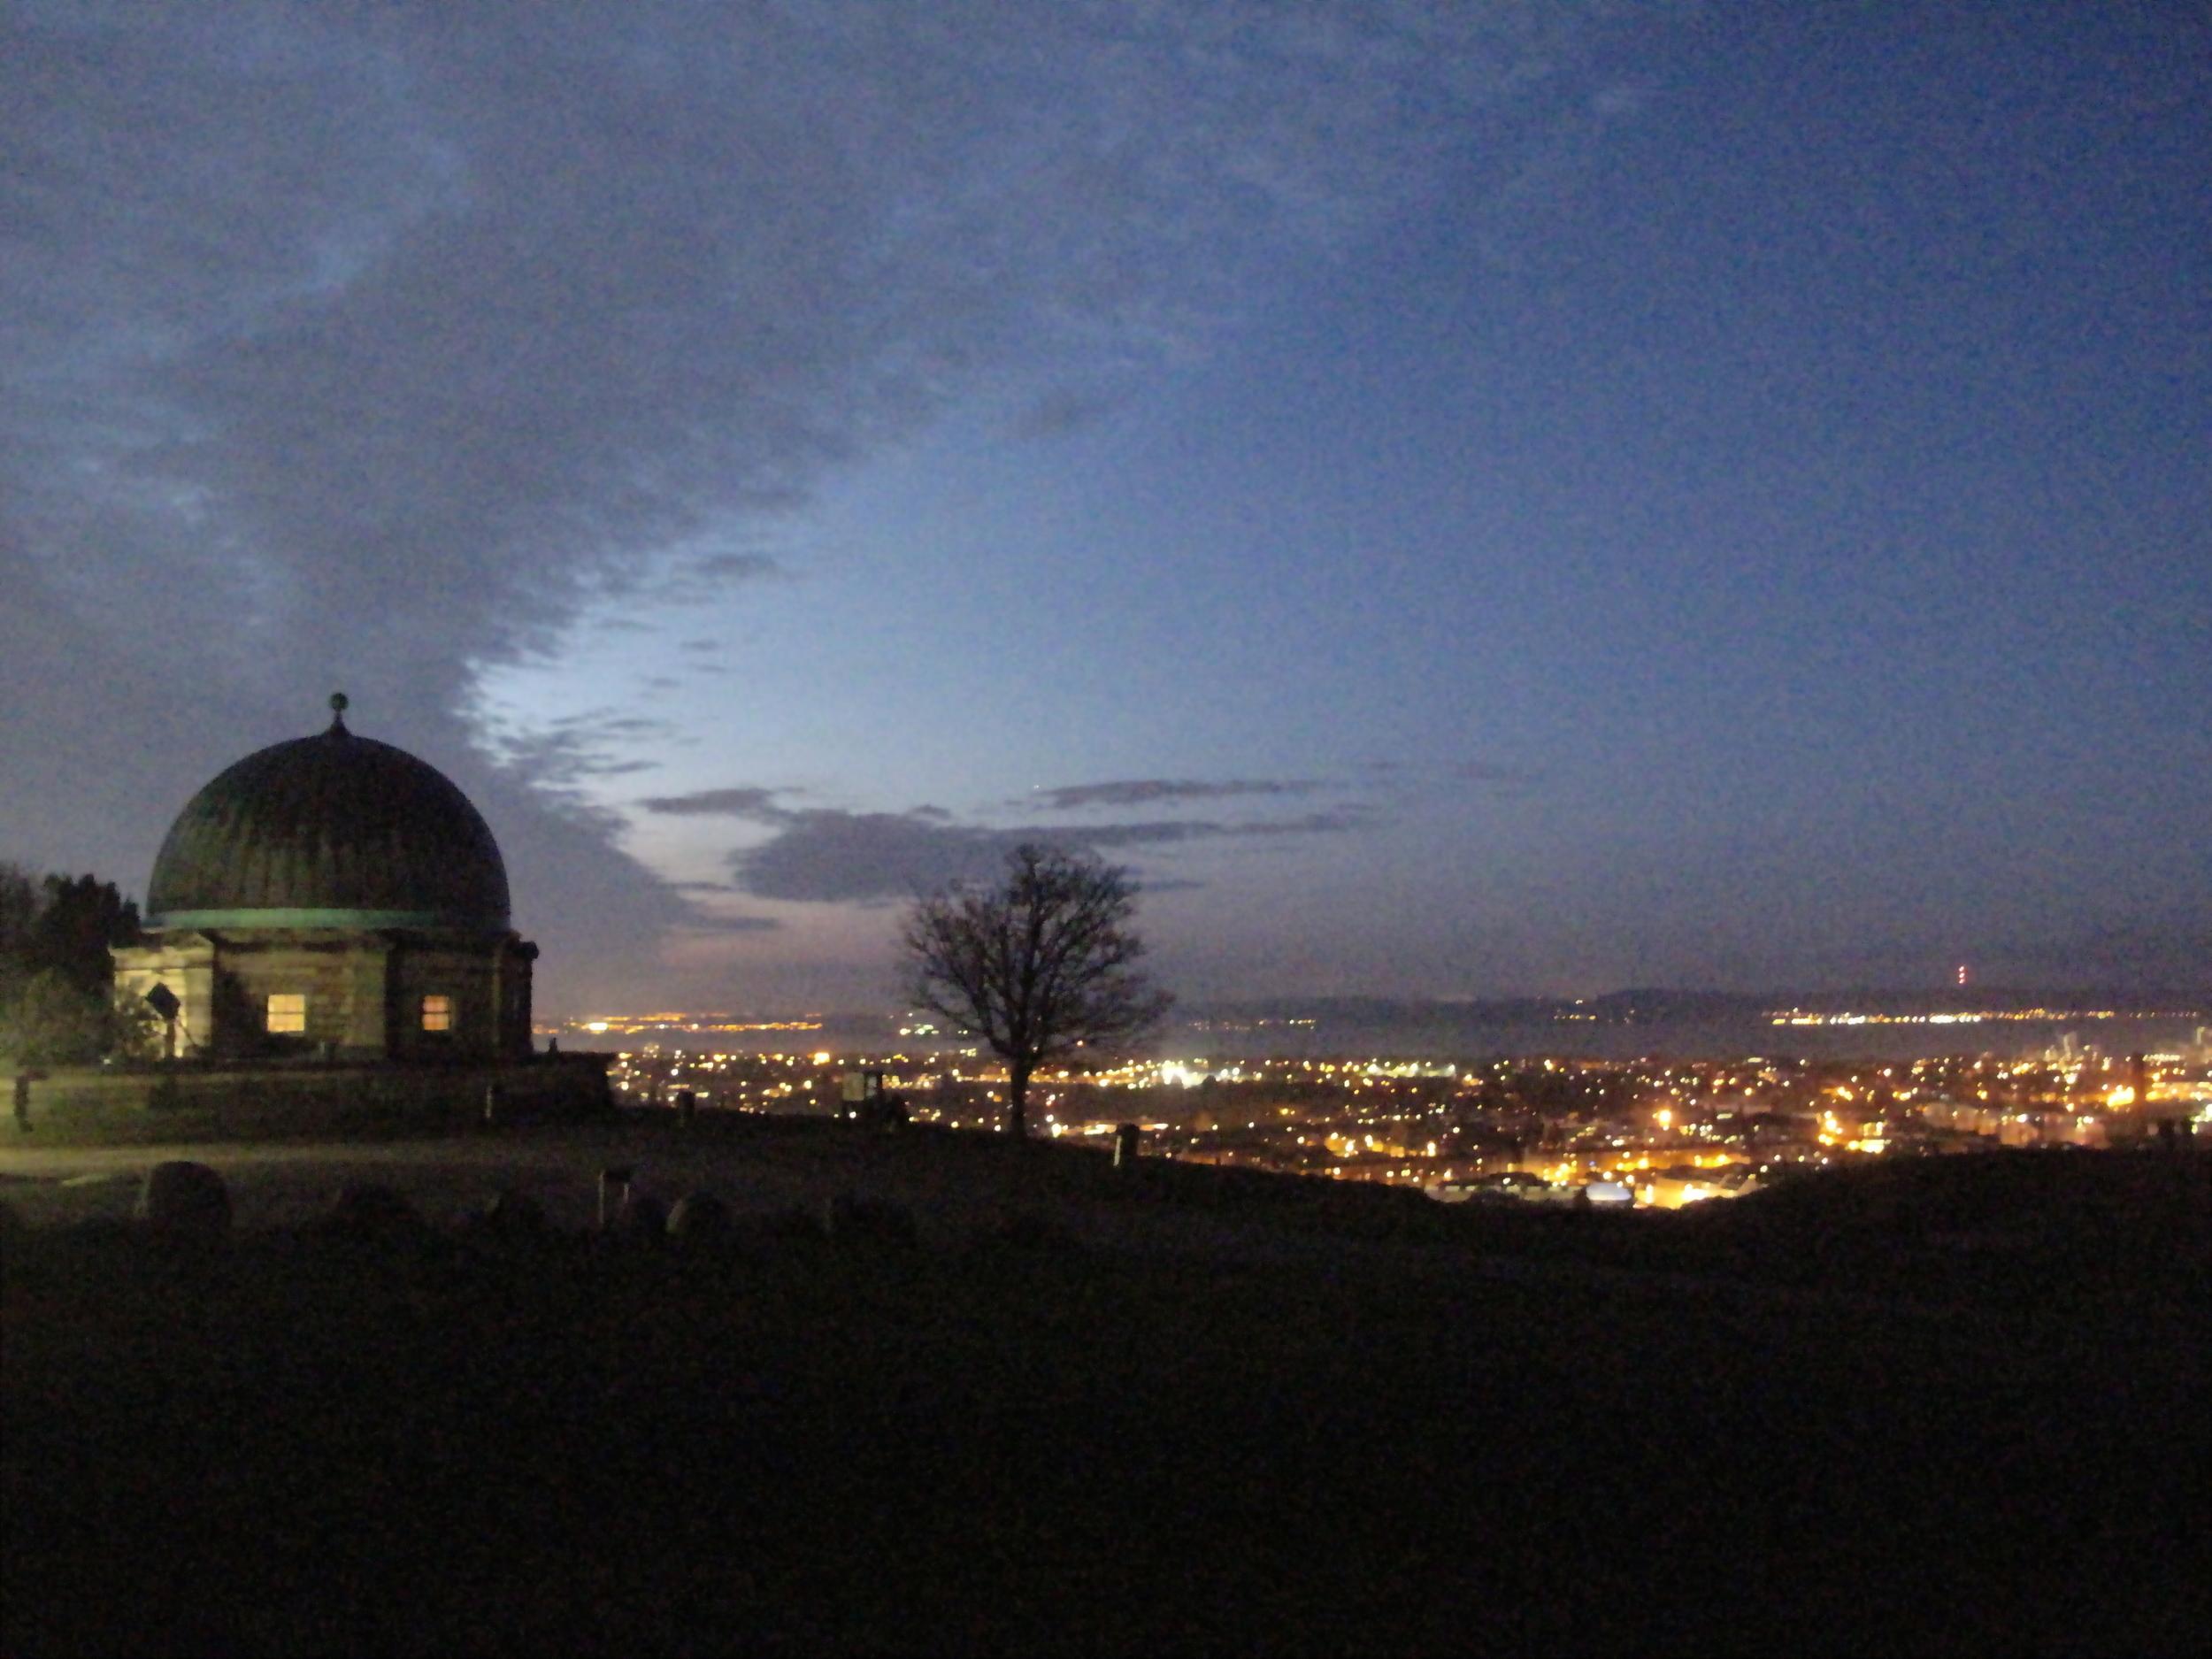 Calton Hill observatory at night, Edinburgh.